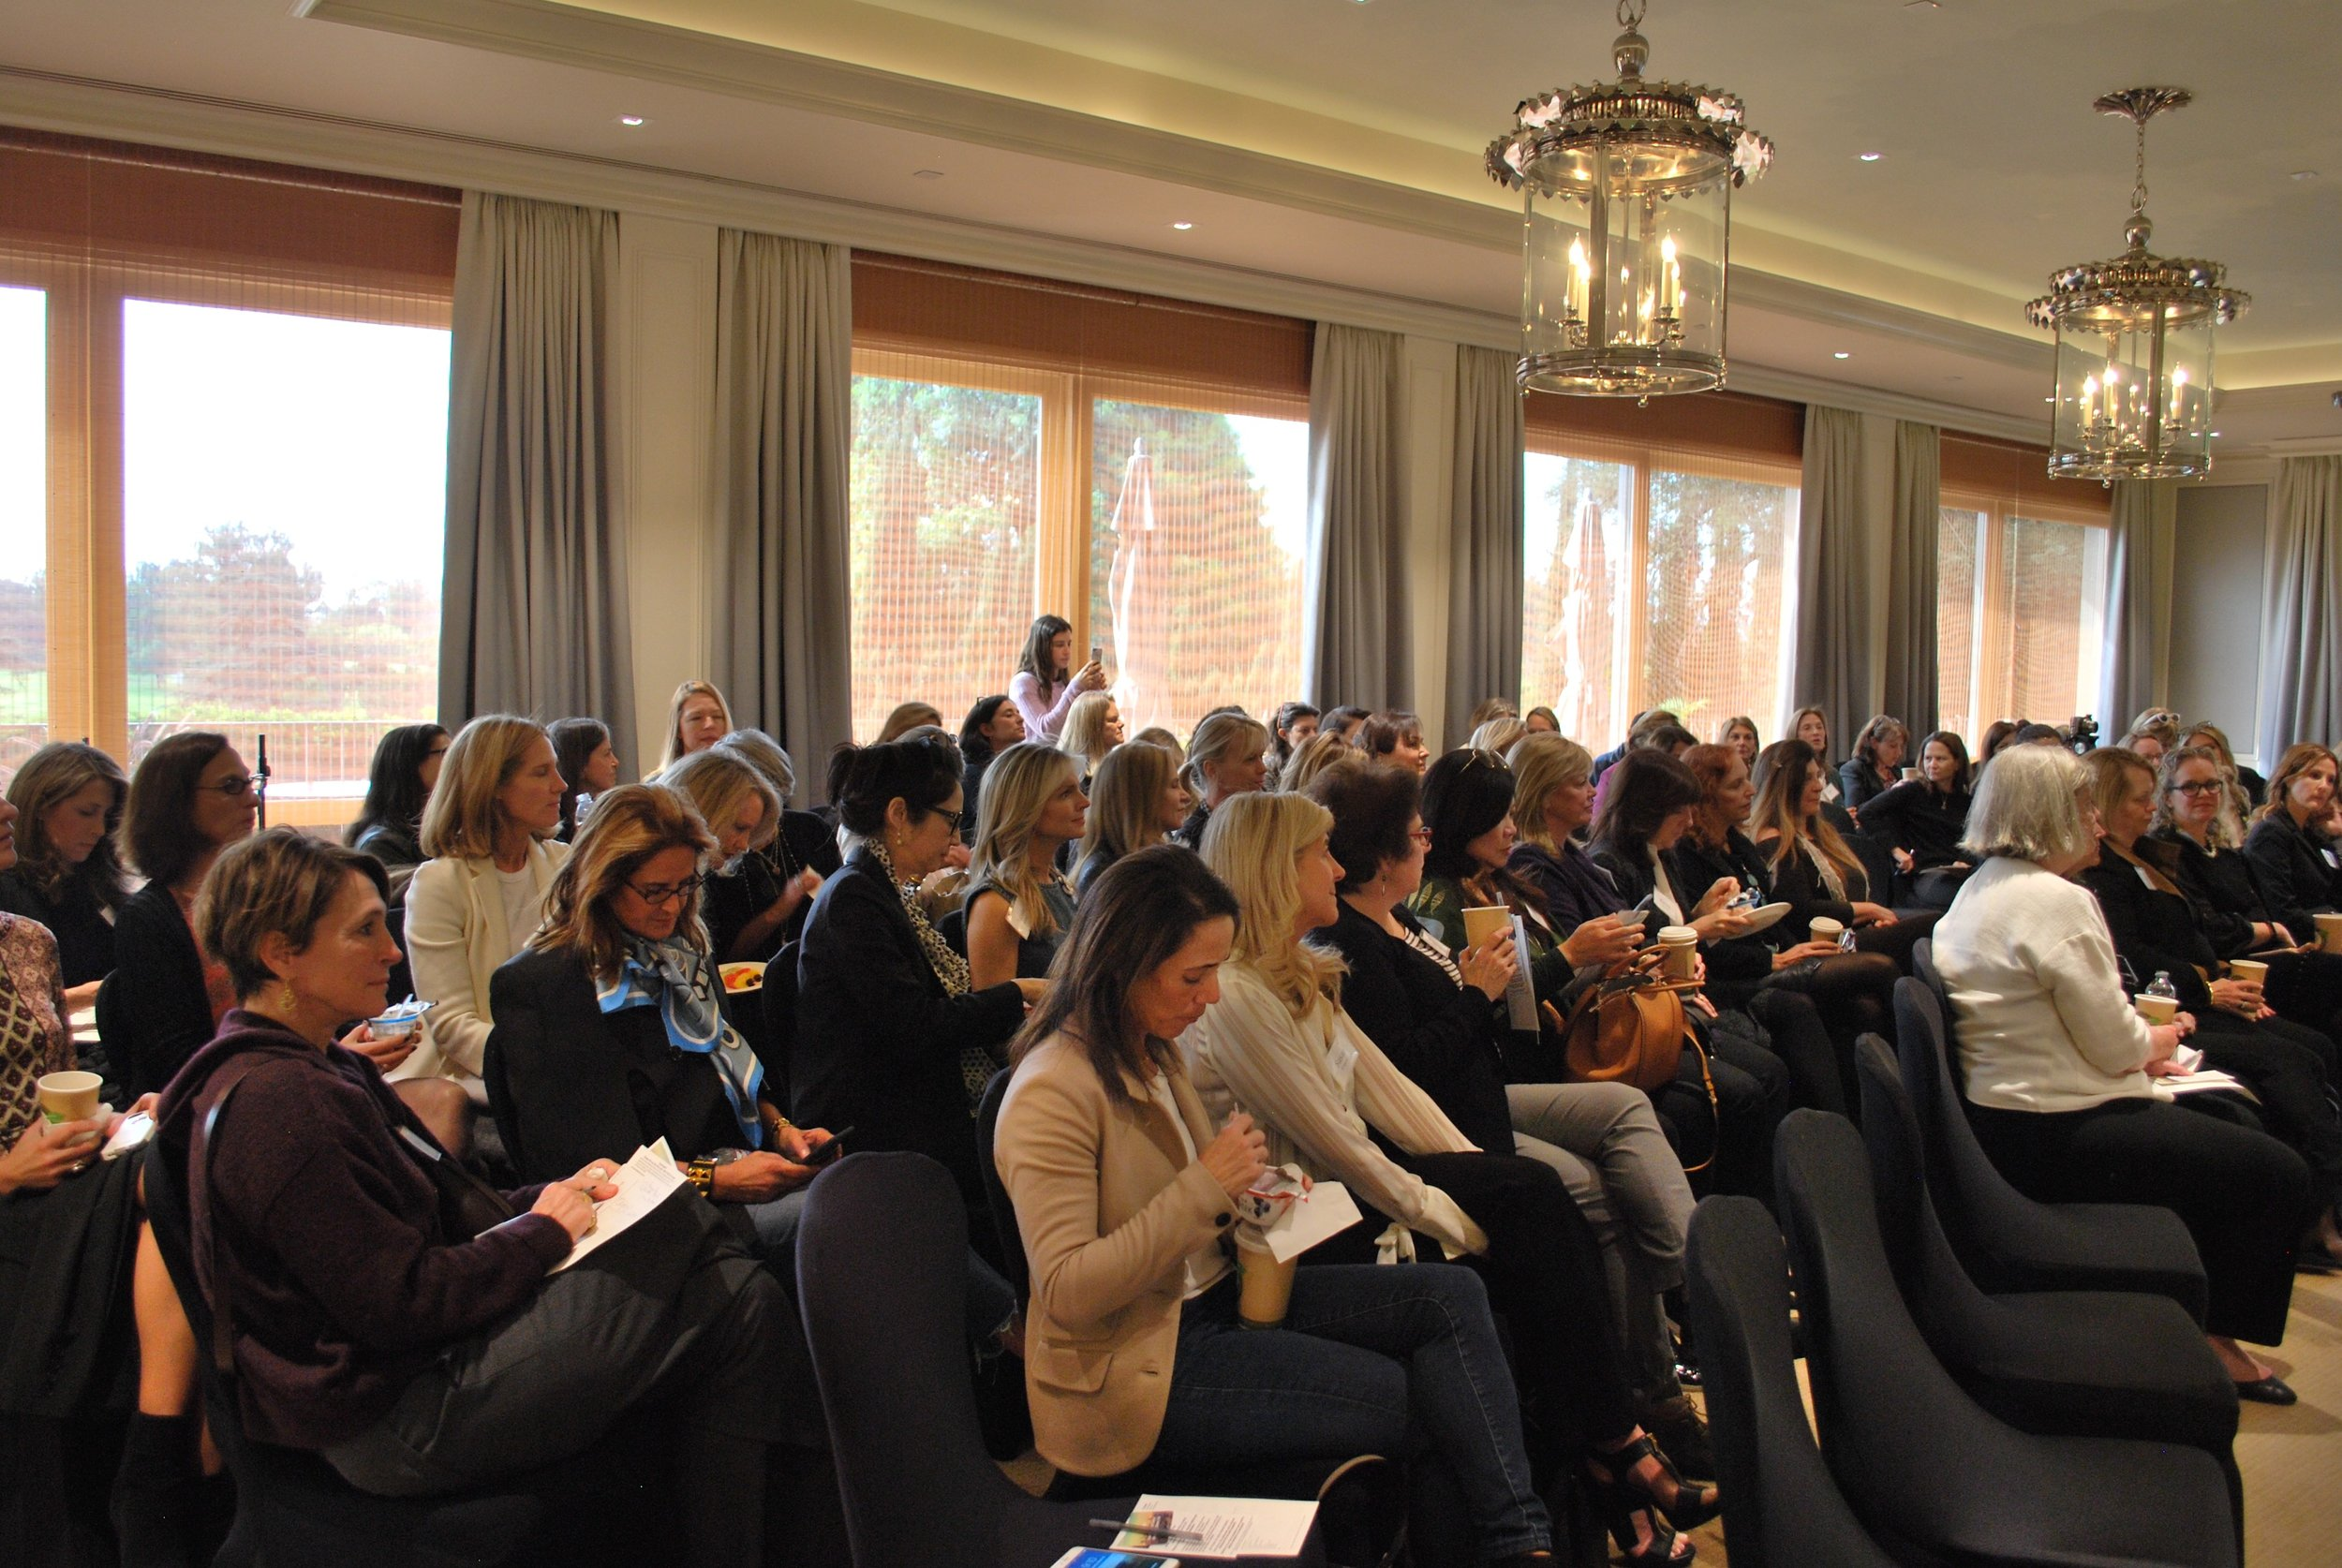 2018-3-8 Civicas forum - 14.jpg